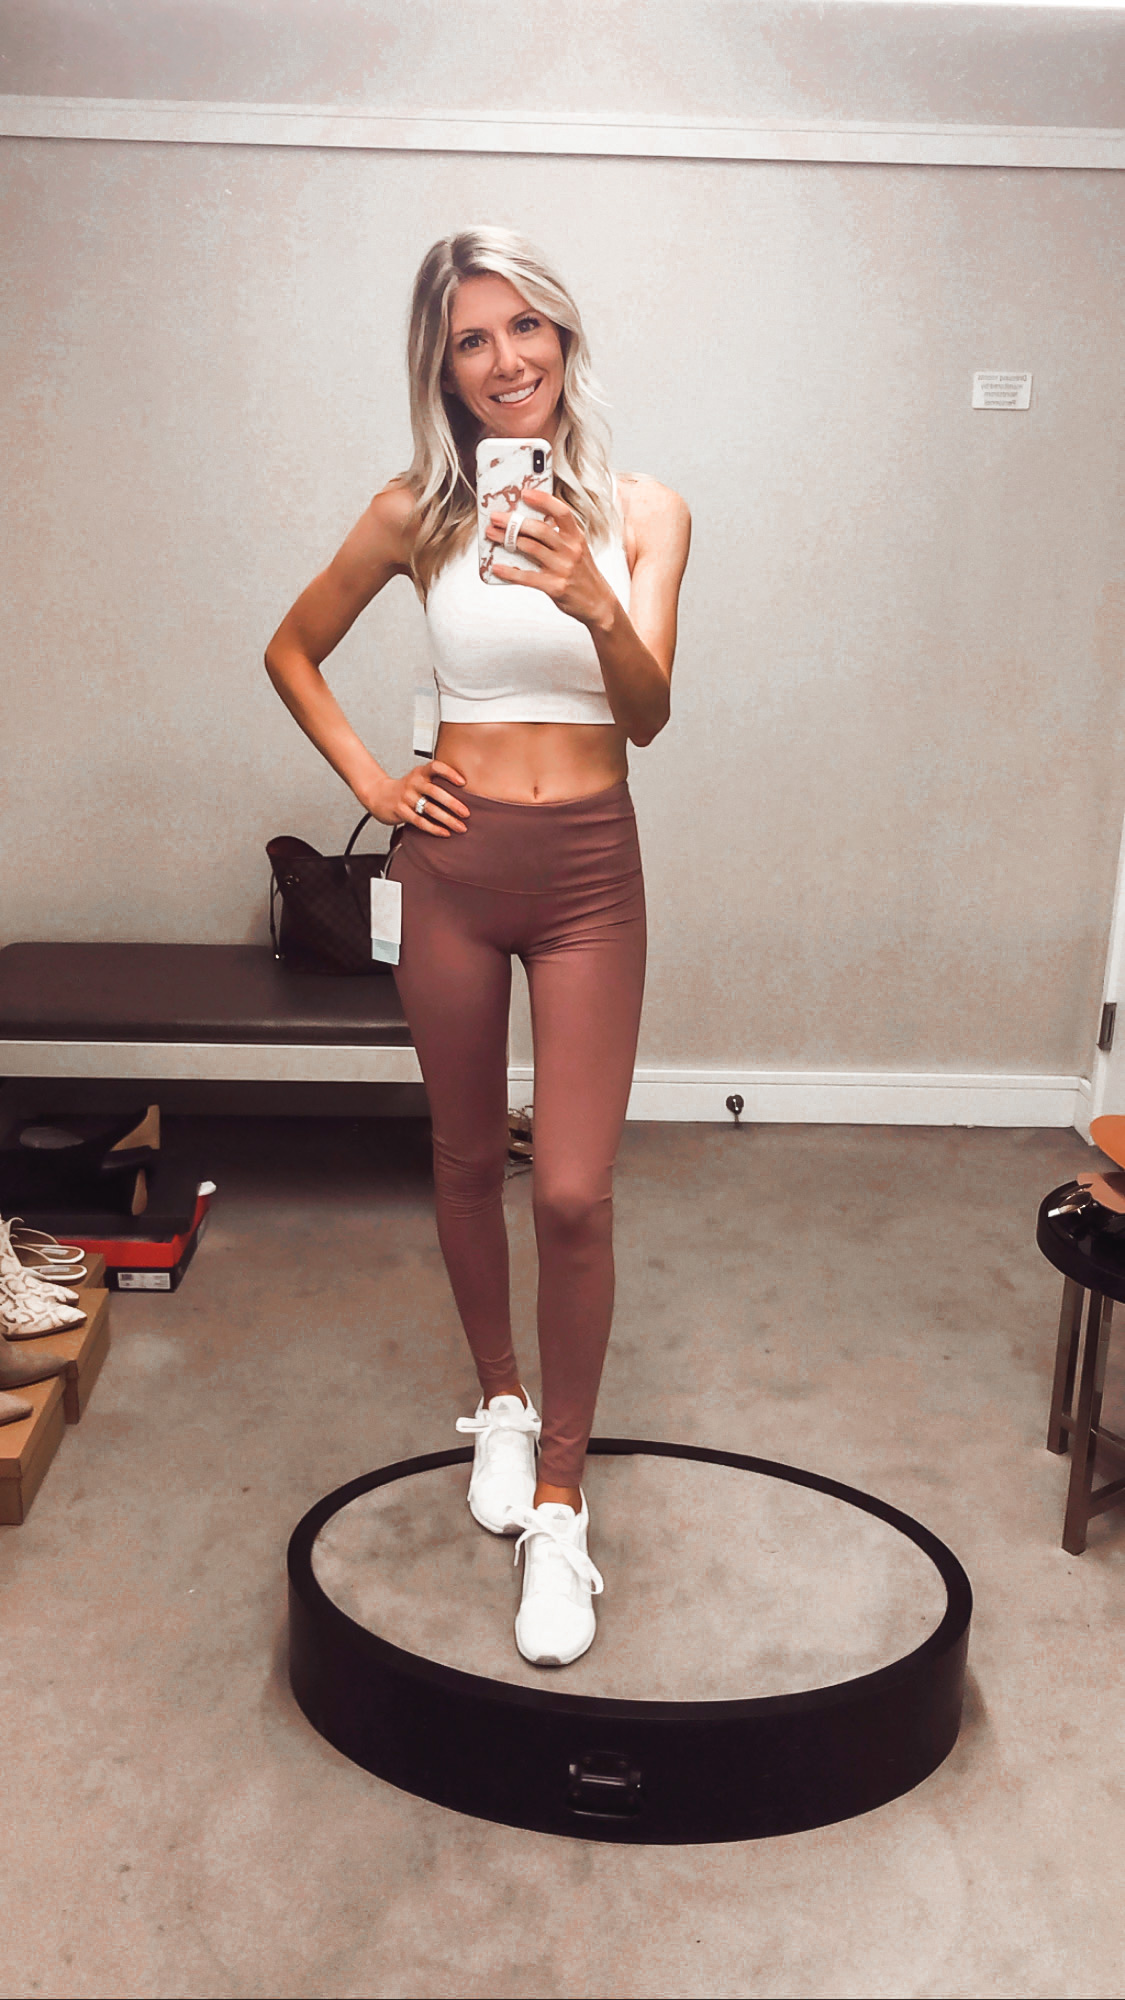 zella leggings and sports bra